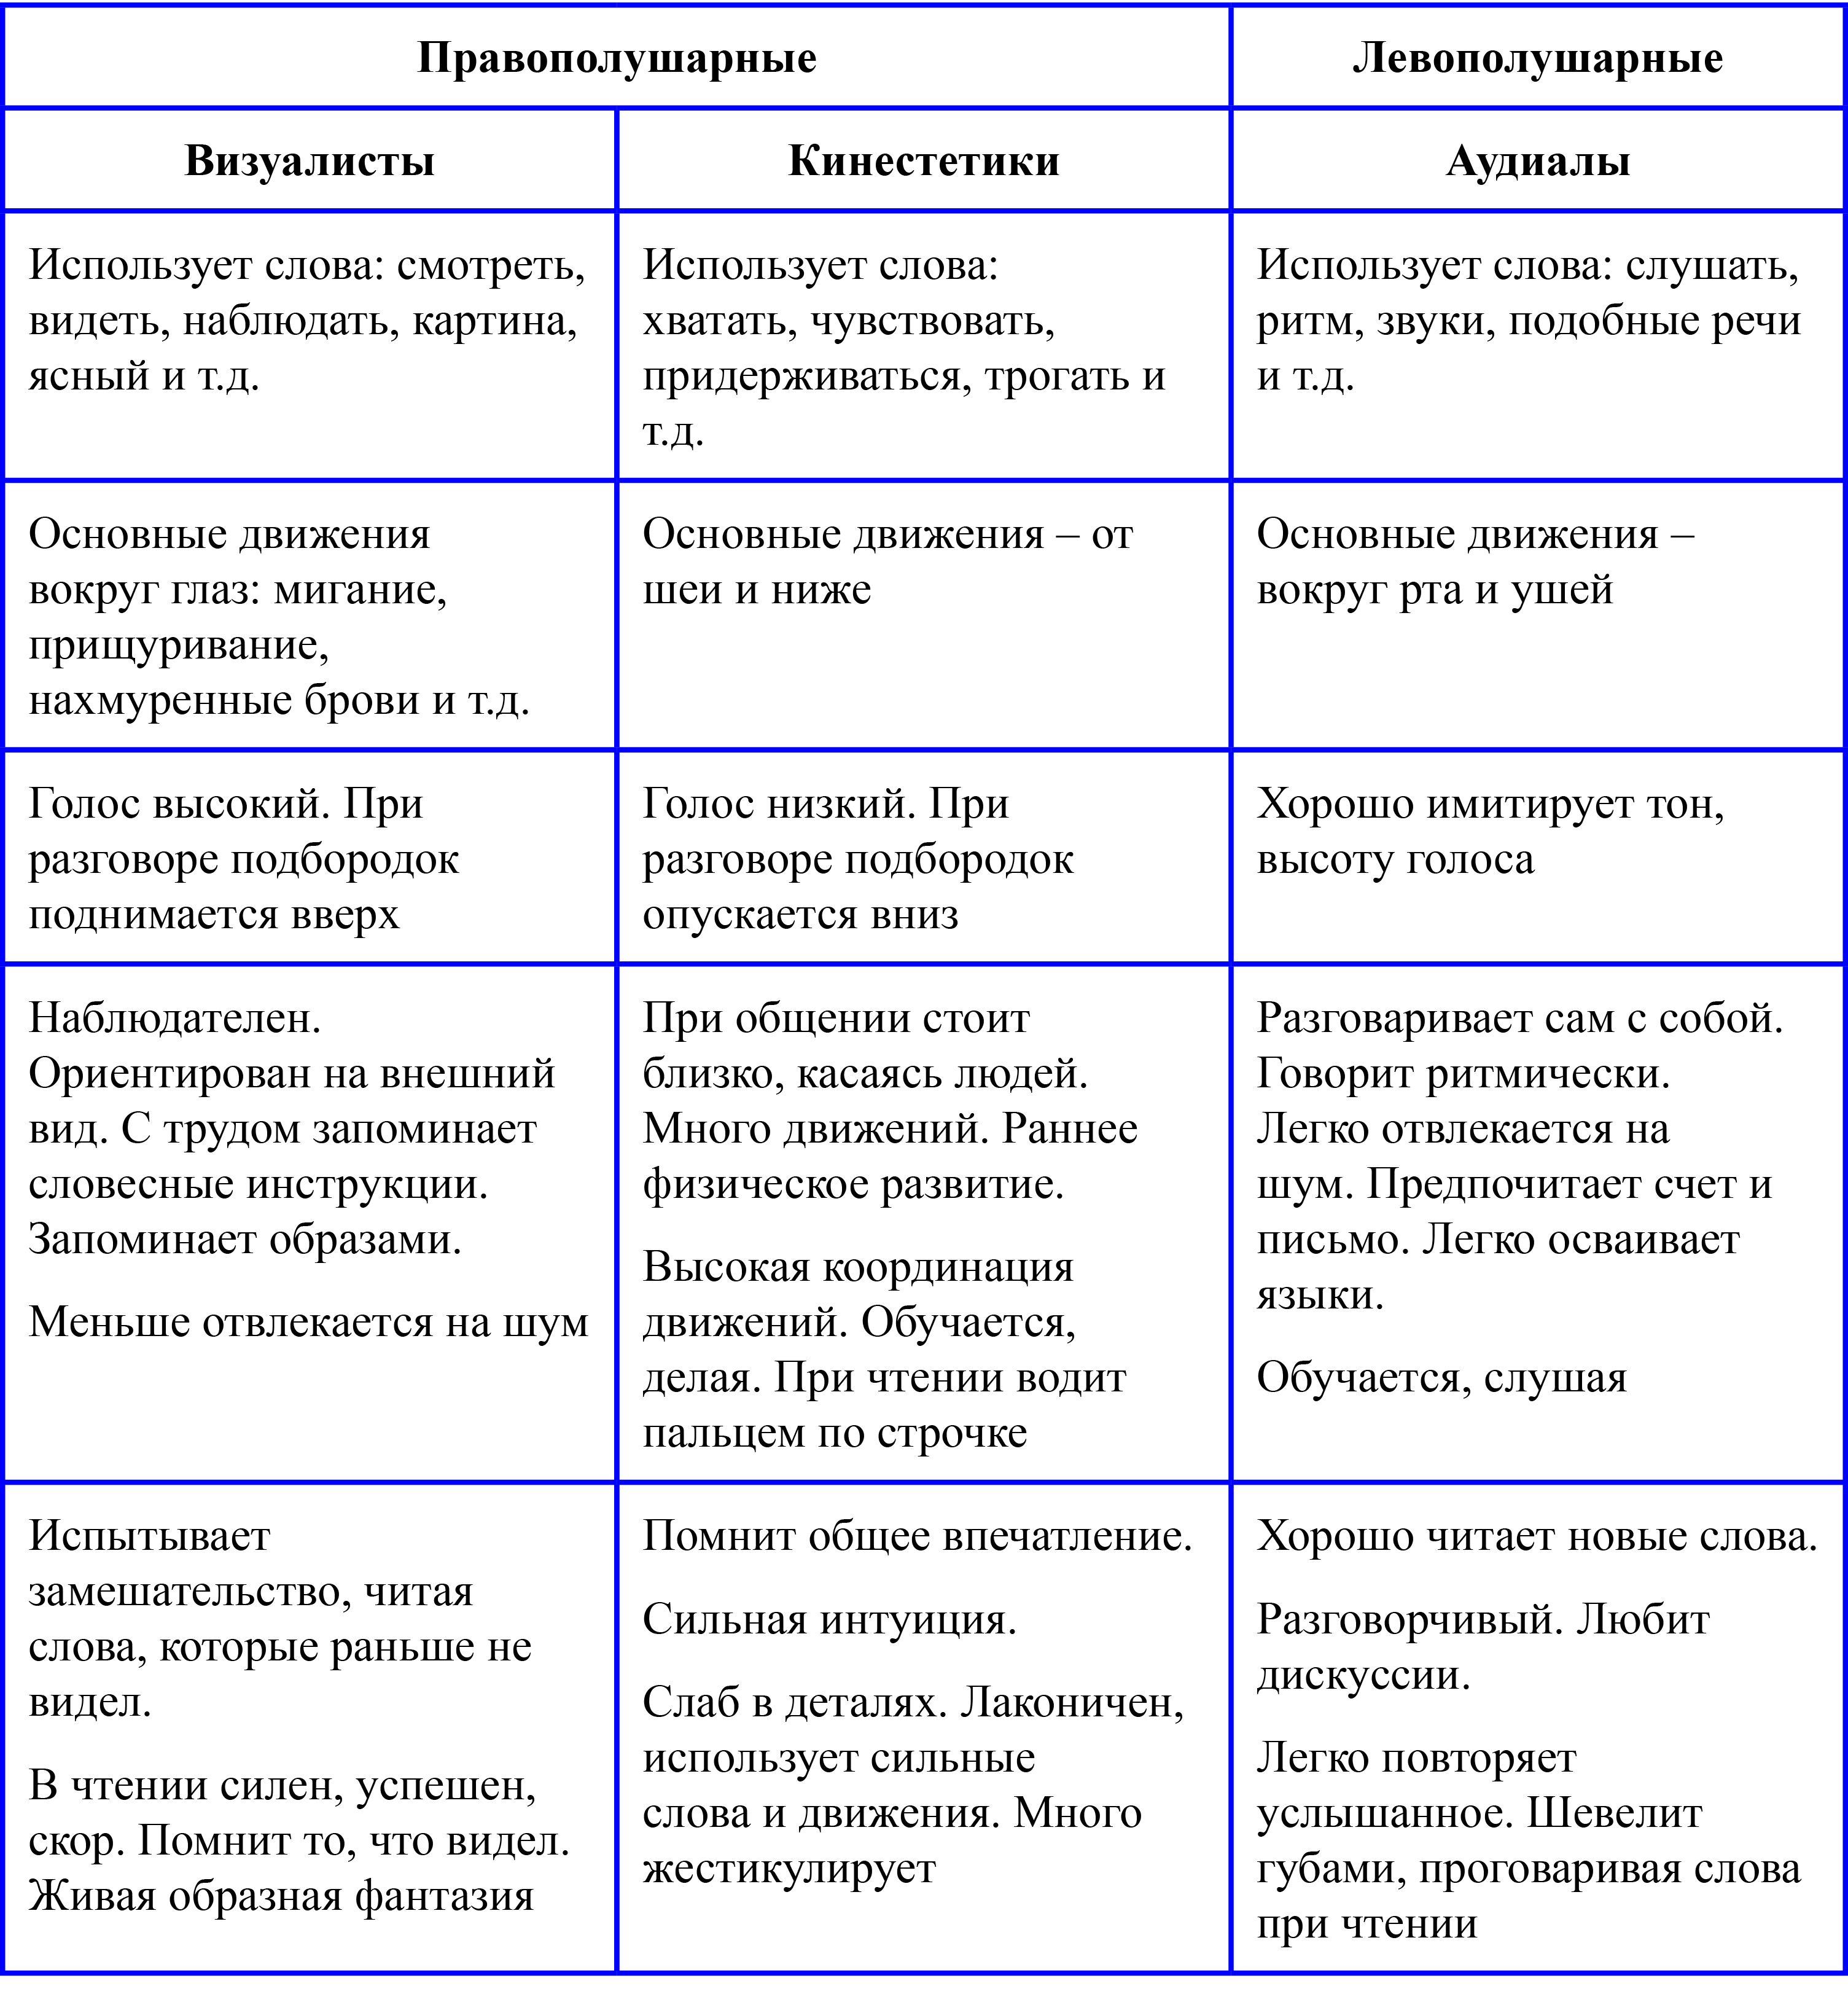 Визуалы кинестетики аудиалы тест. тест на восприятие: аудиал, визуал, кинестетик, дискрет